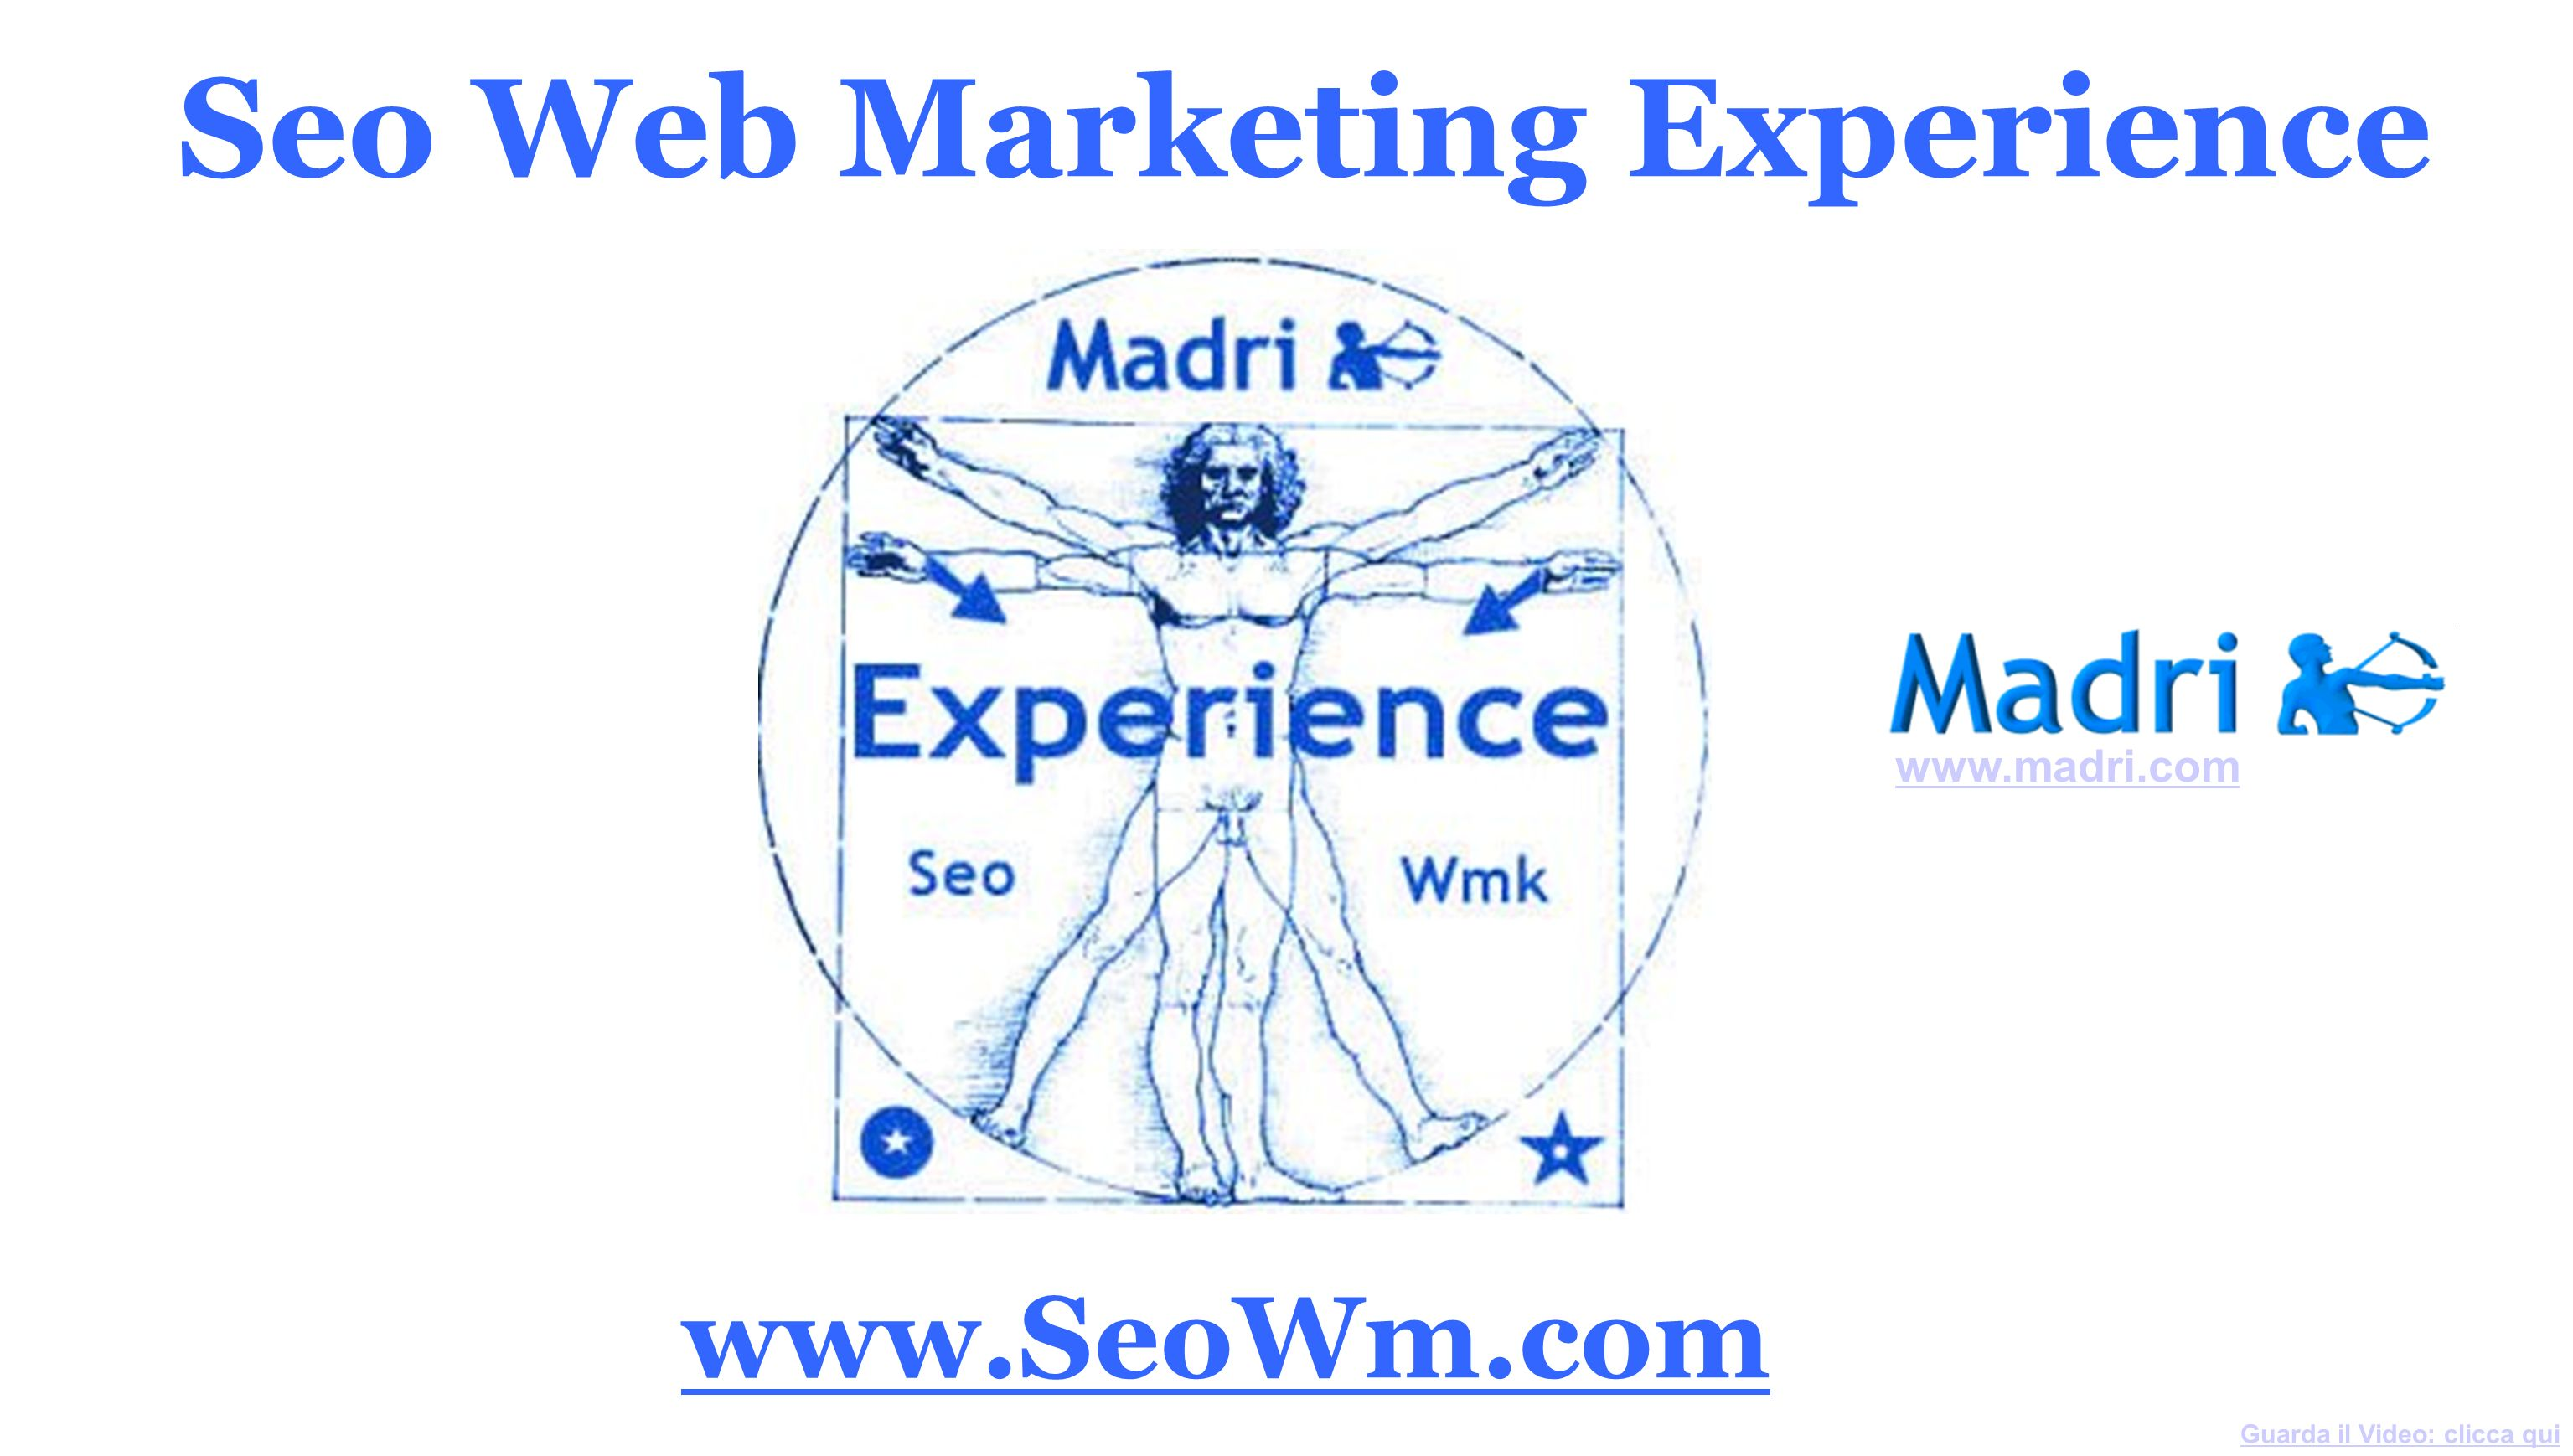 www.SeoWm.com Seo Web Marketing Experience Guarda il Video: clicca qui www.madri.com